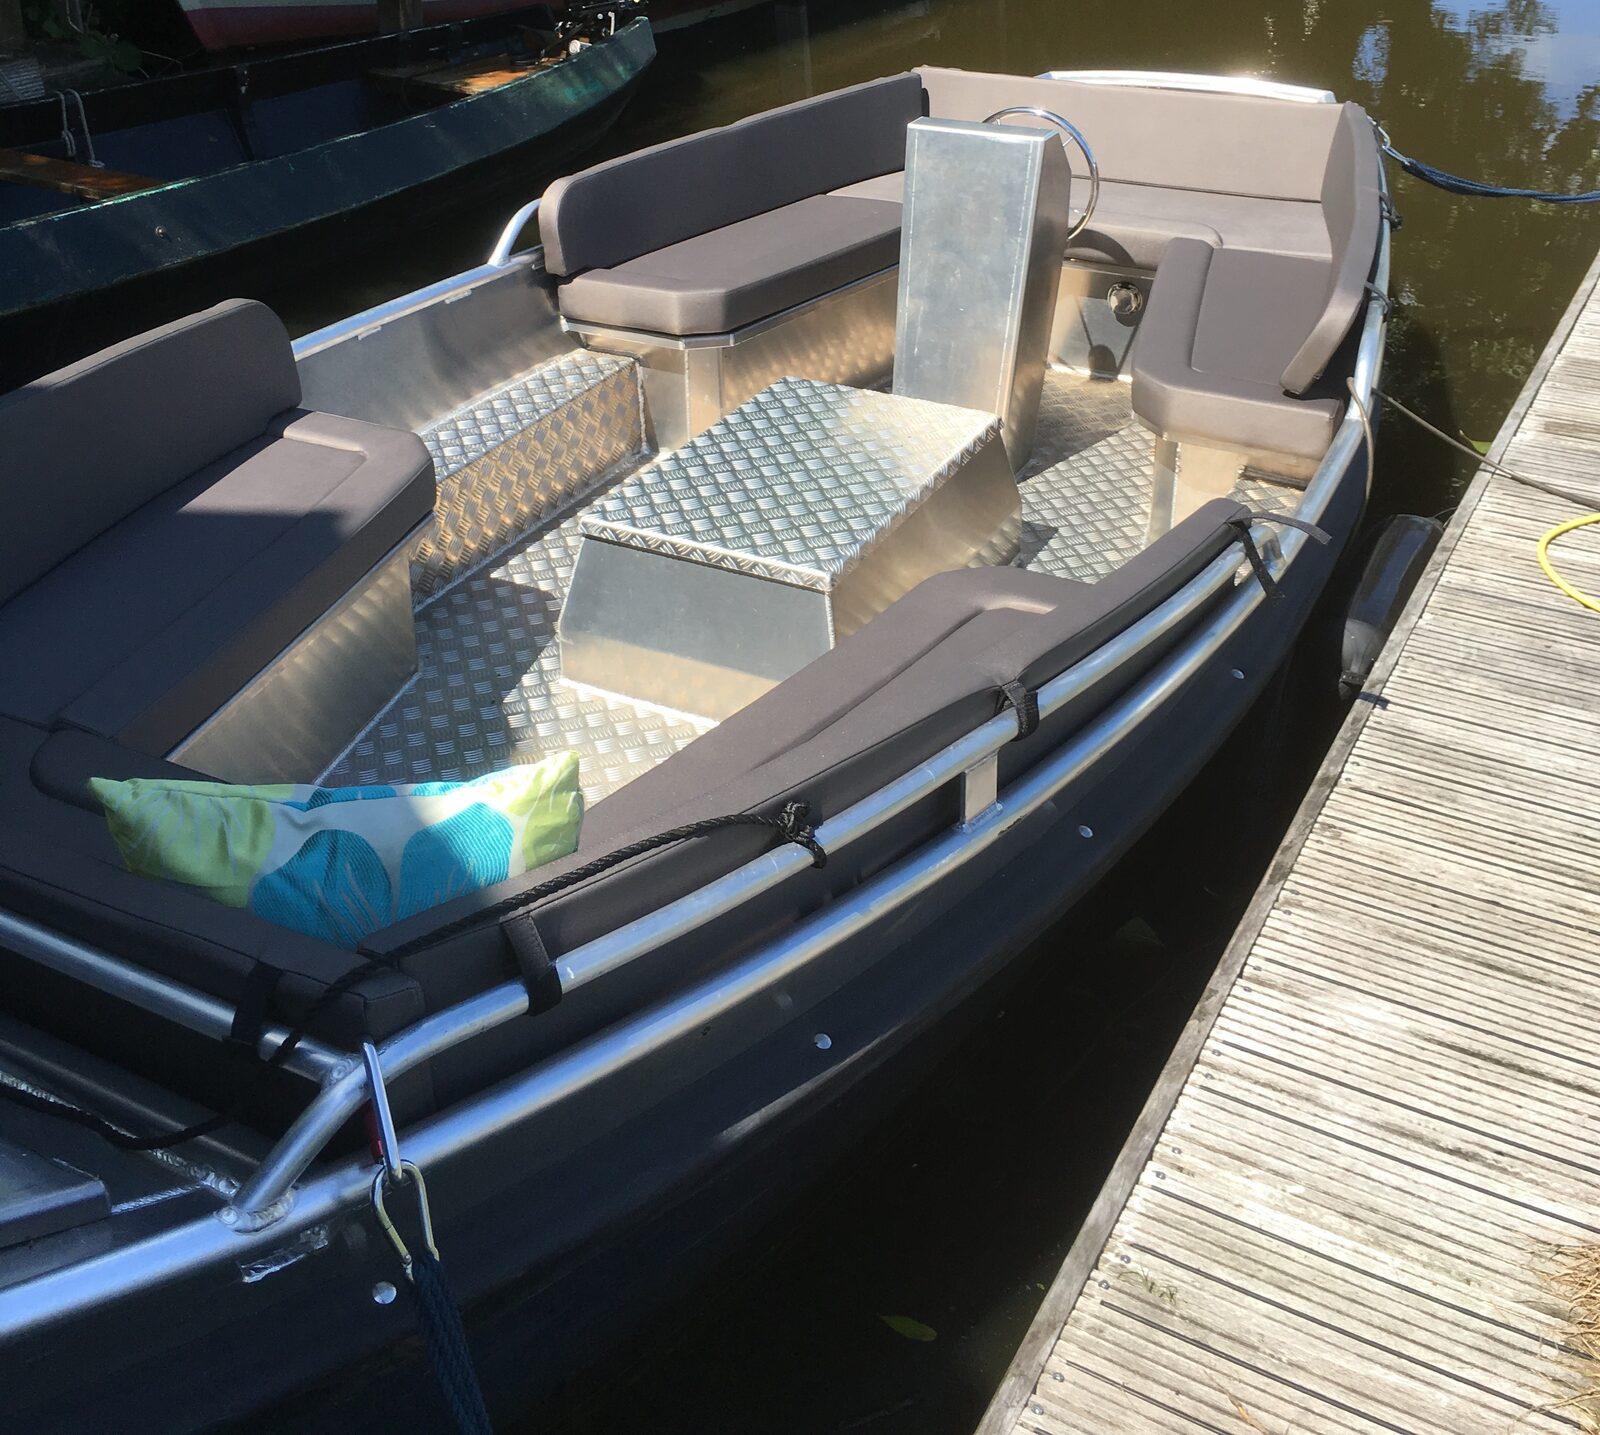 Boat rental Kroondomein